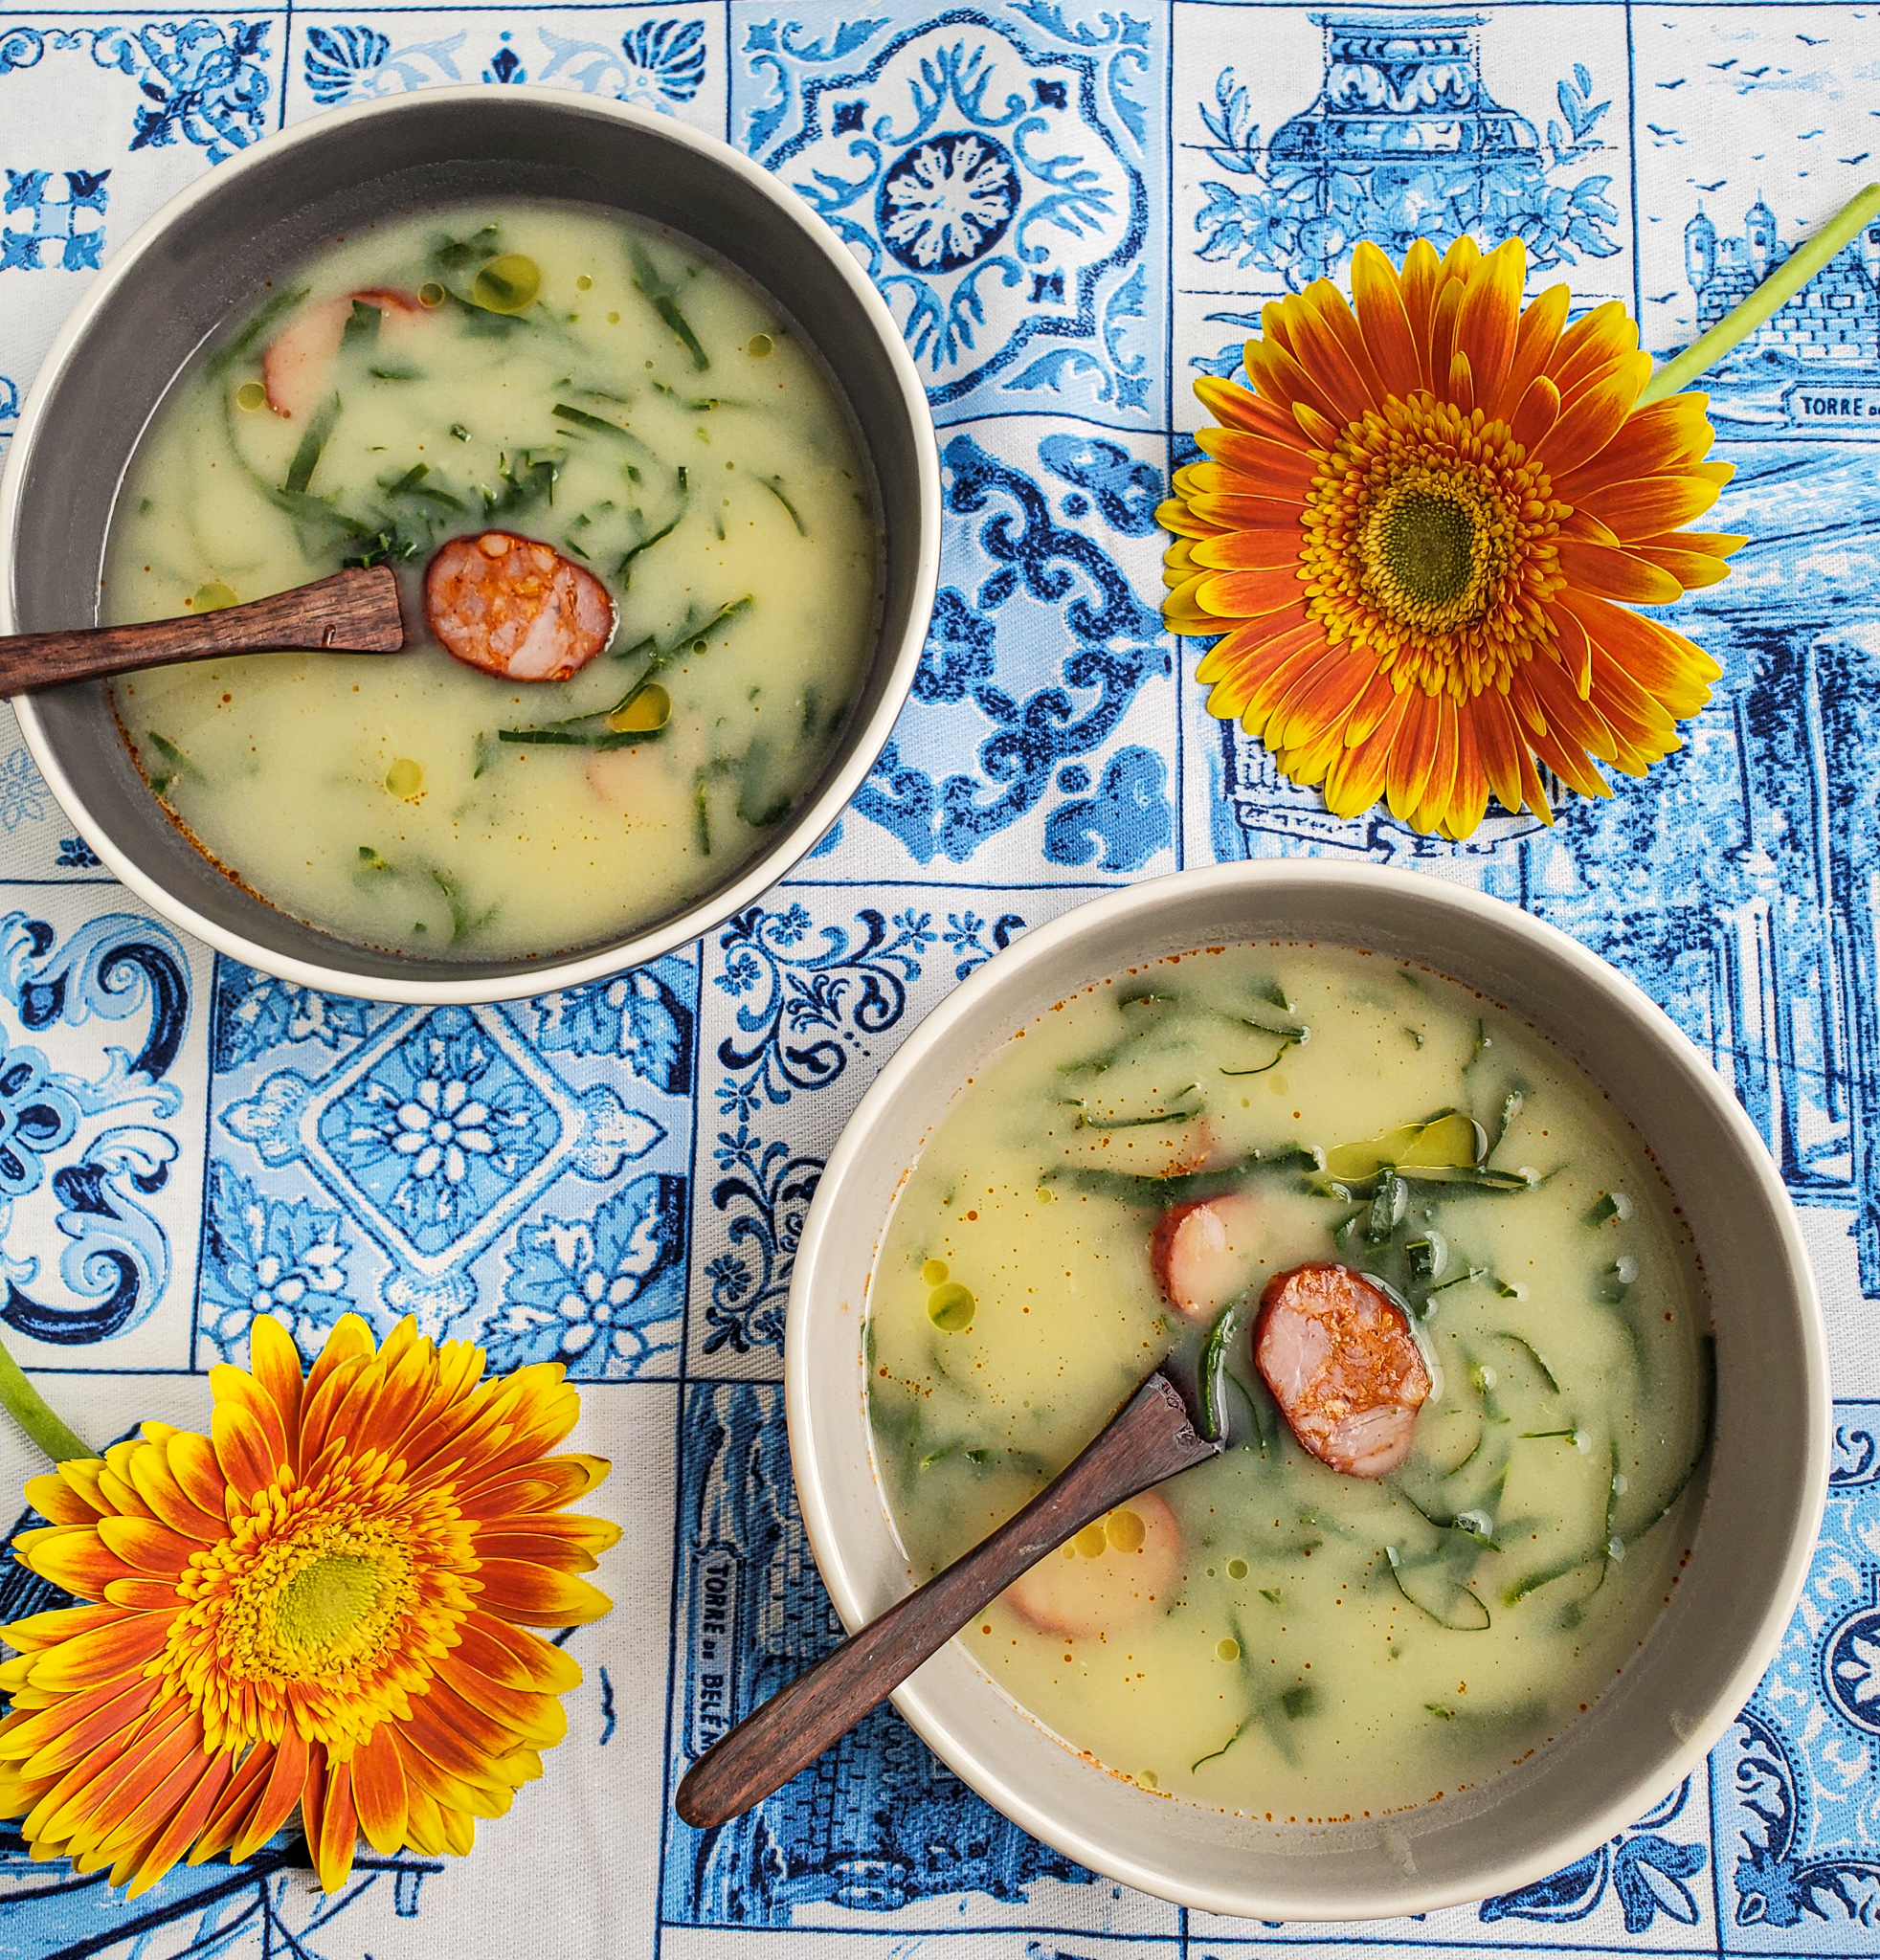 Portuguese 'Caldo Verde' Soup